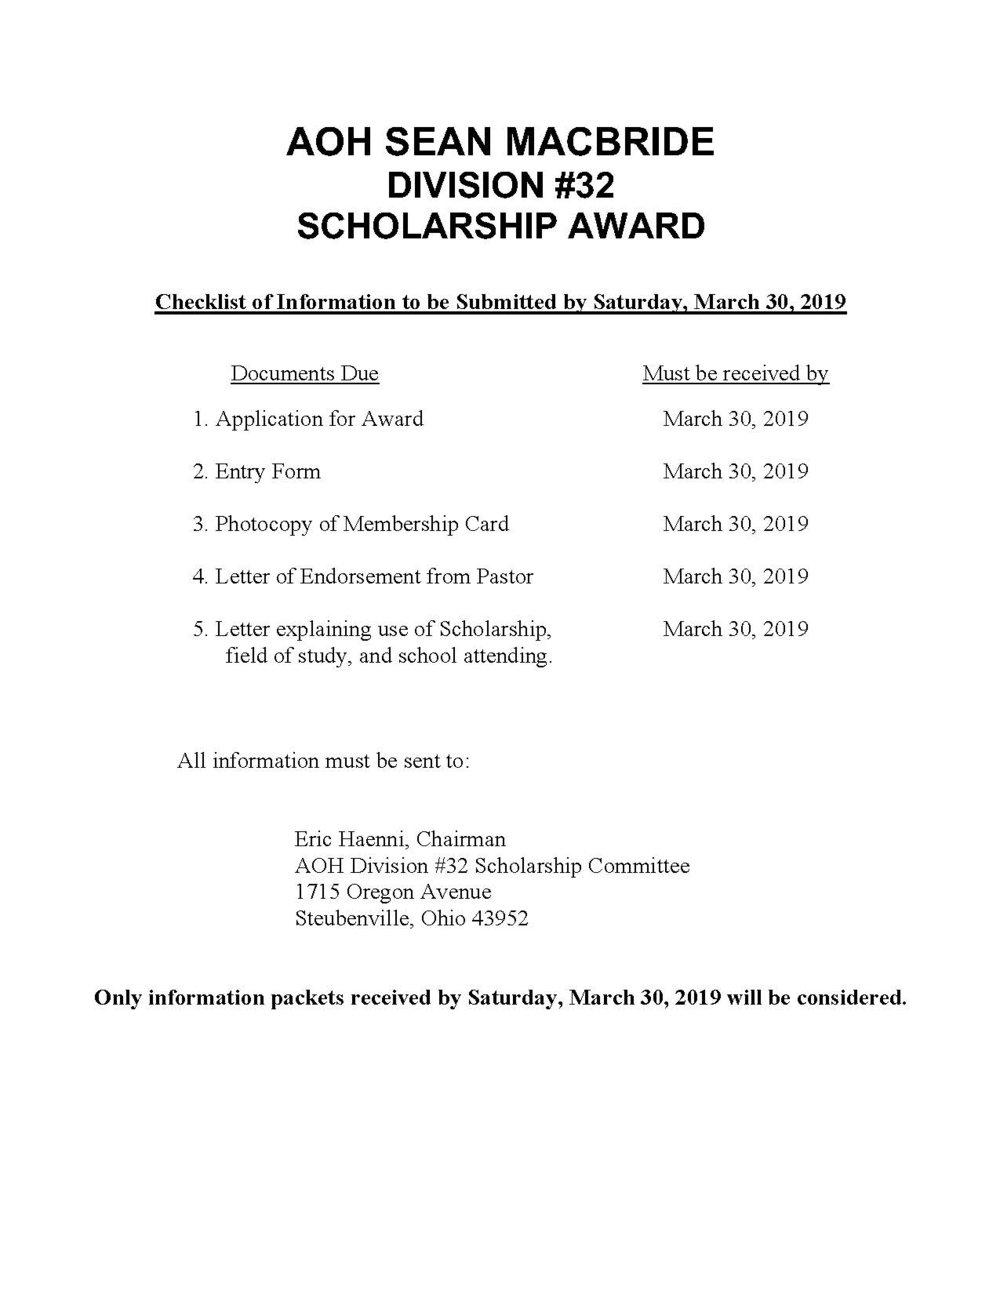 Scholarship checklist_2019.jpg